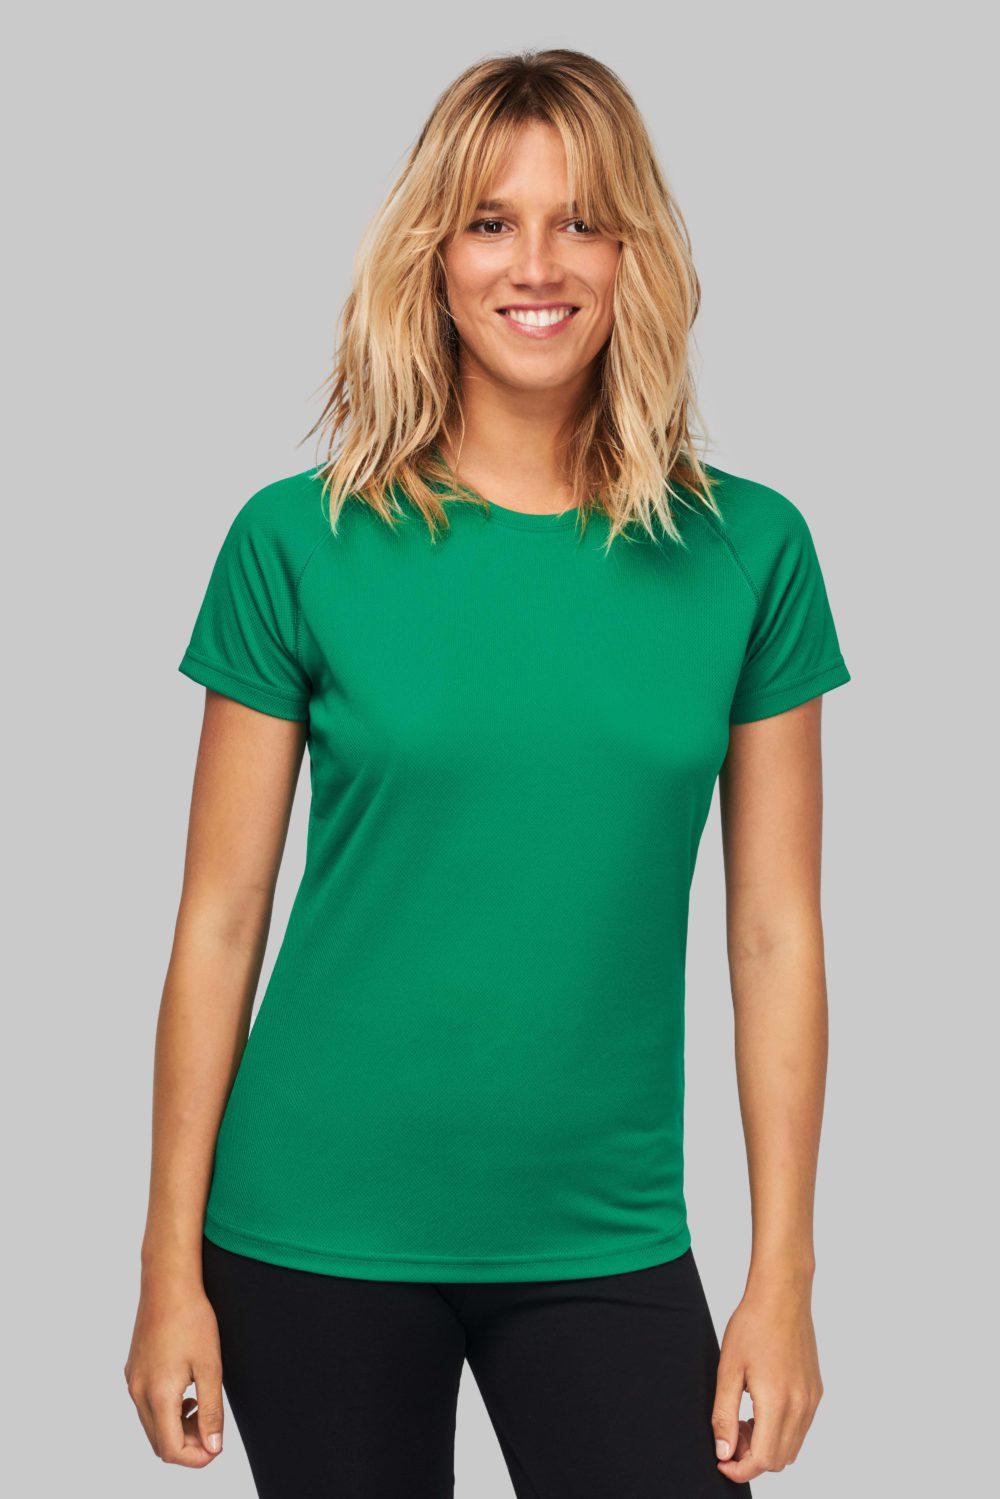 PA439 Functioneel damessportshirt Sportkledij PAS Print Proact